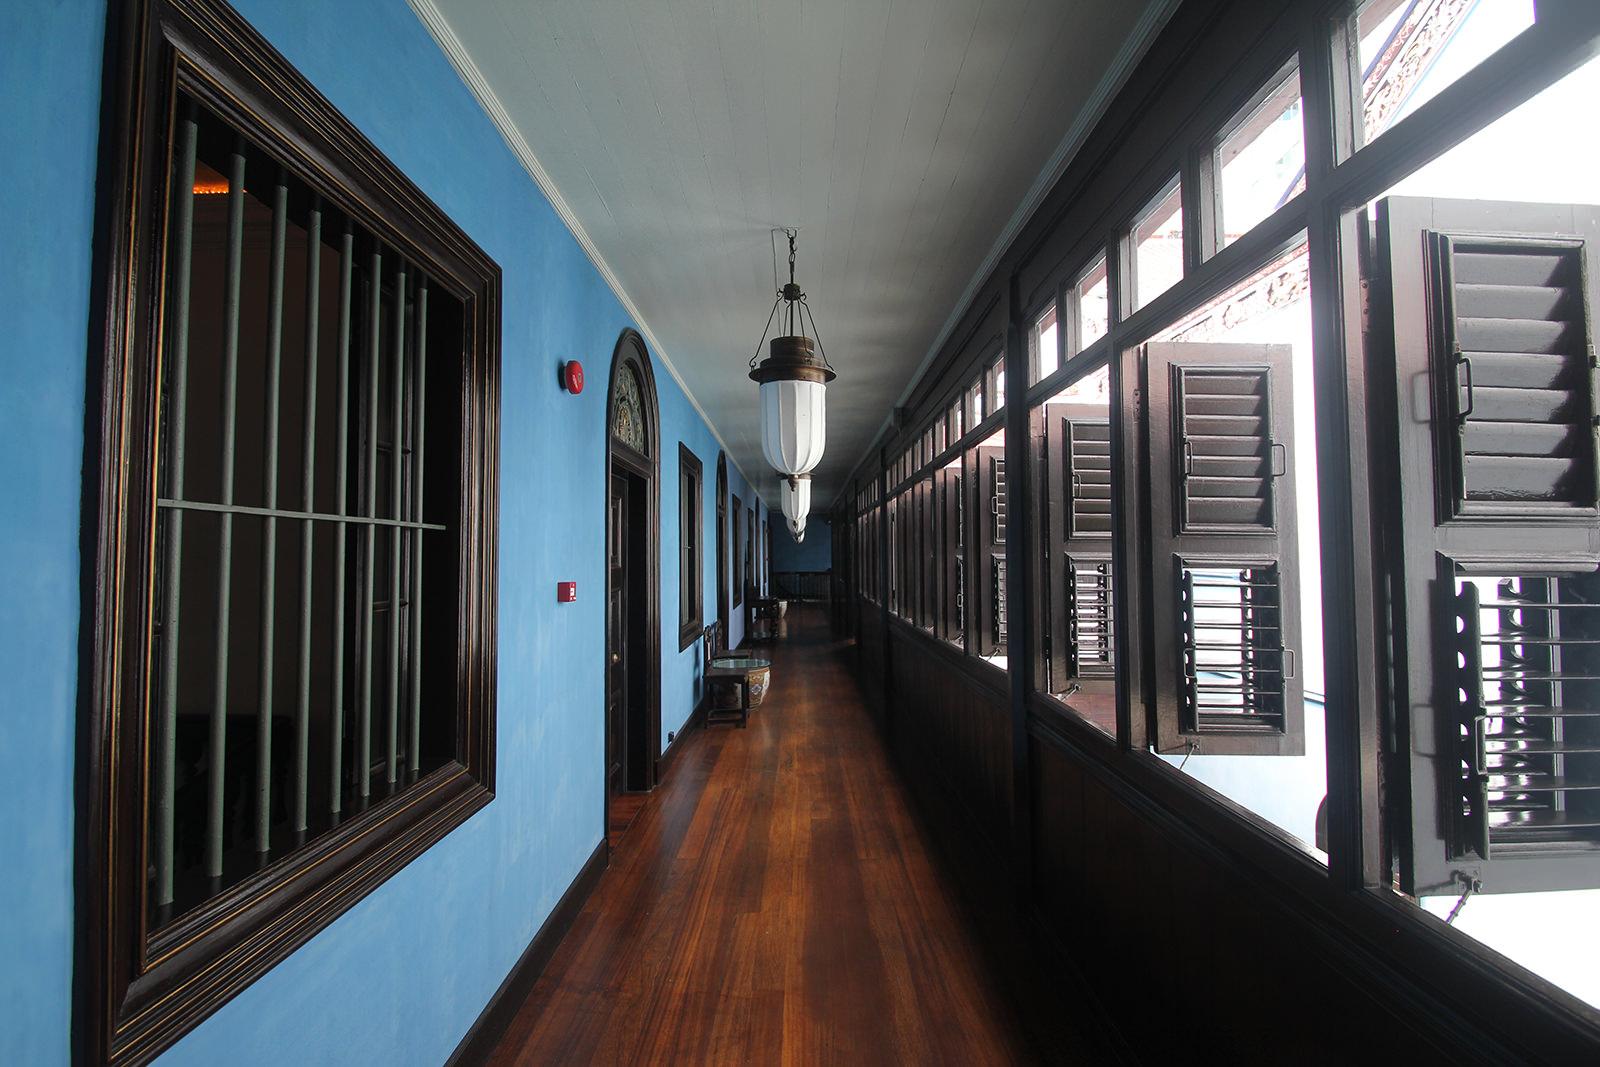 boutique-hotel-penang-island-blue-mansion-architecture-13 Architecture